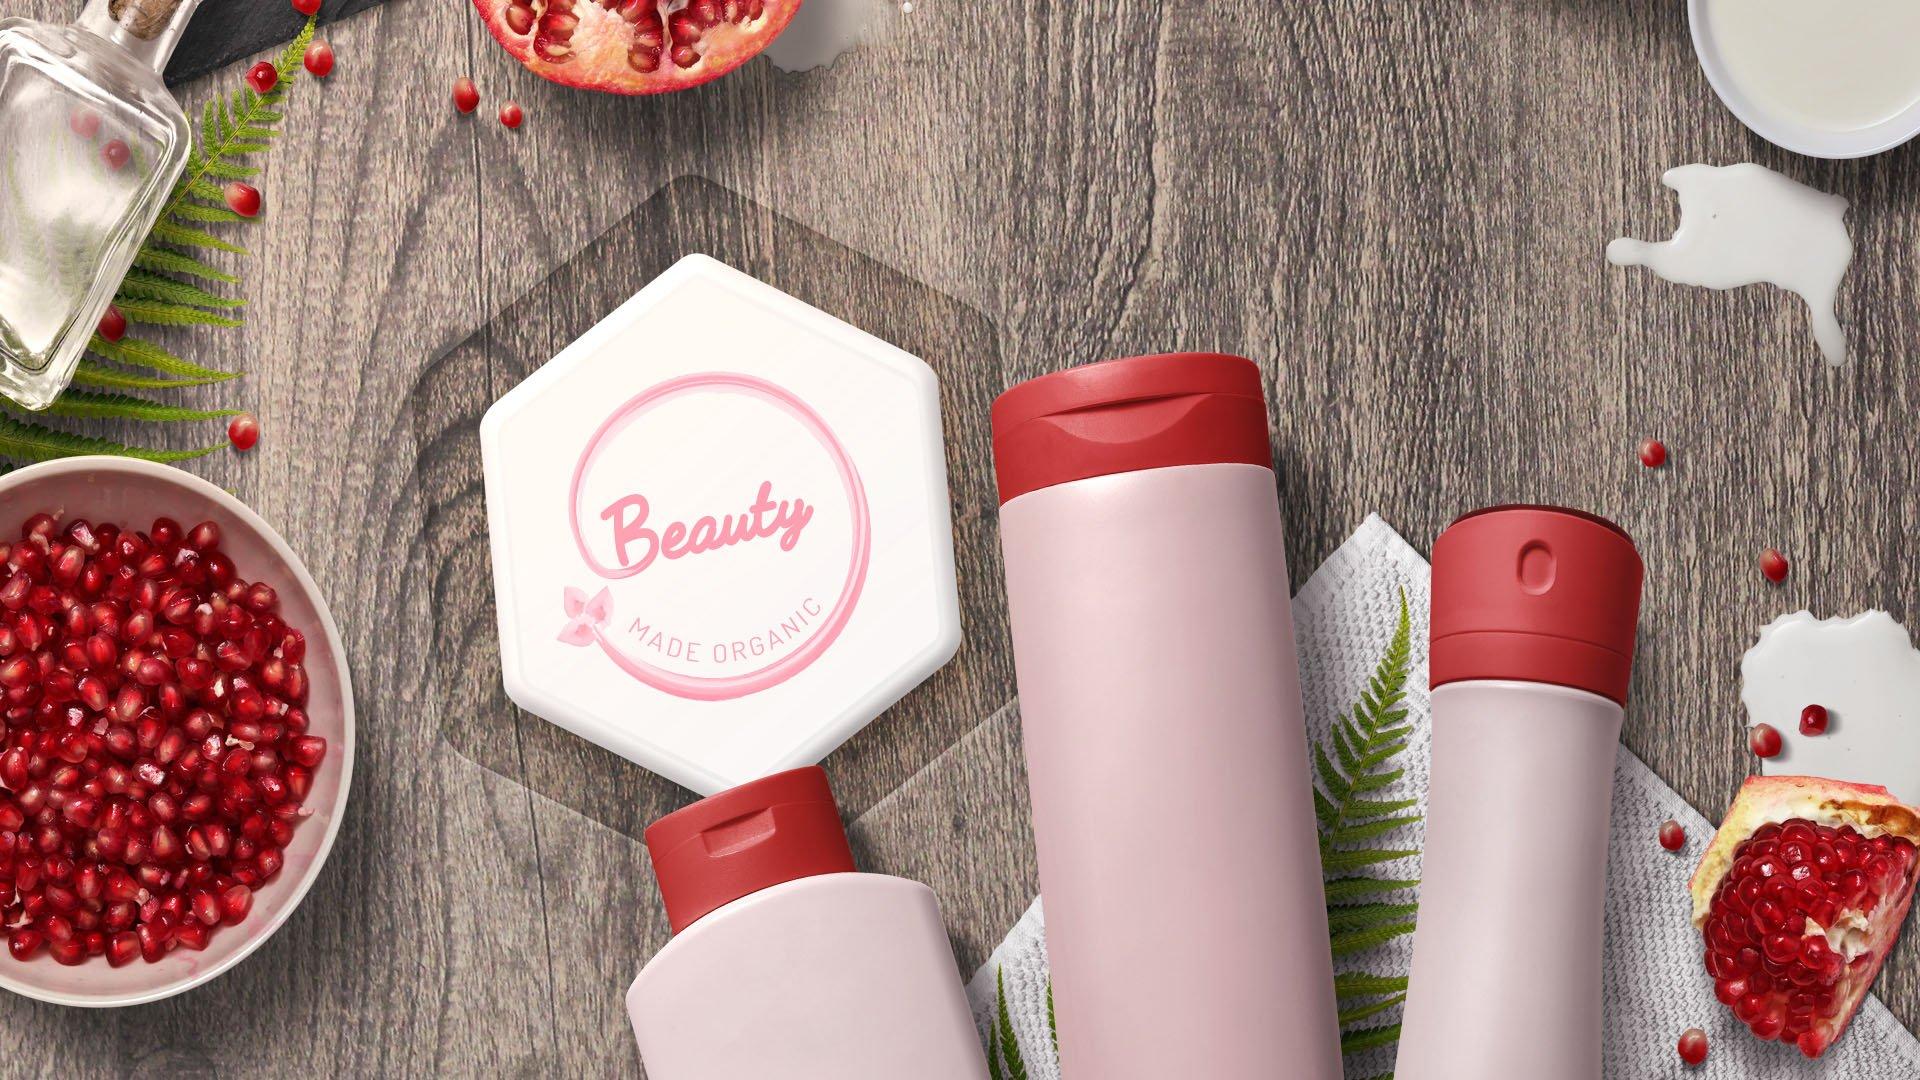 Beauty Made Organic